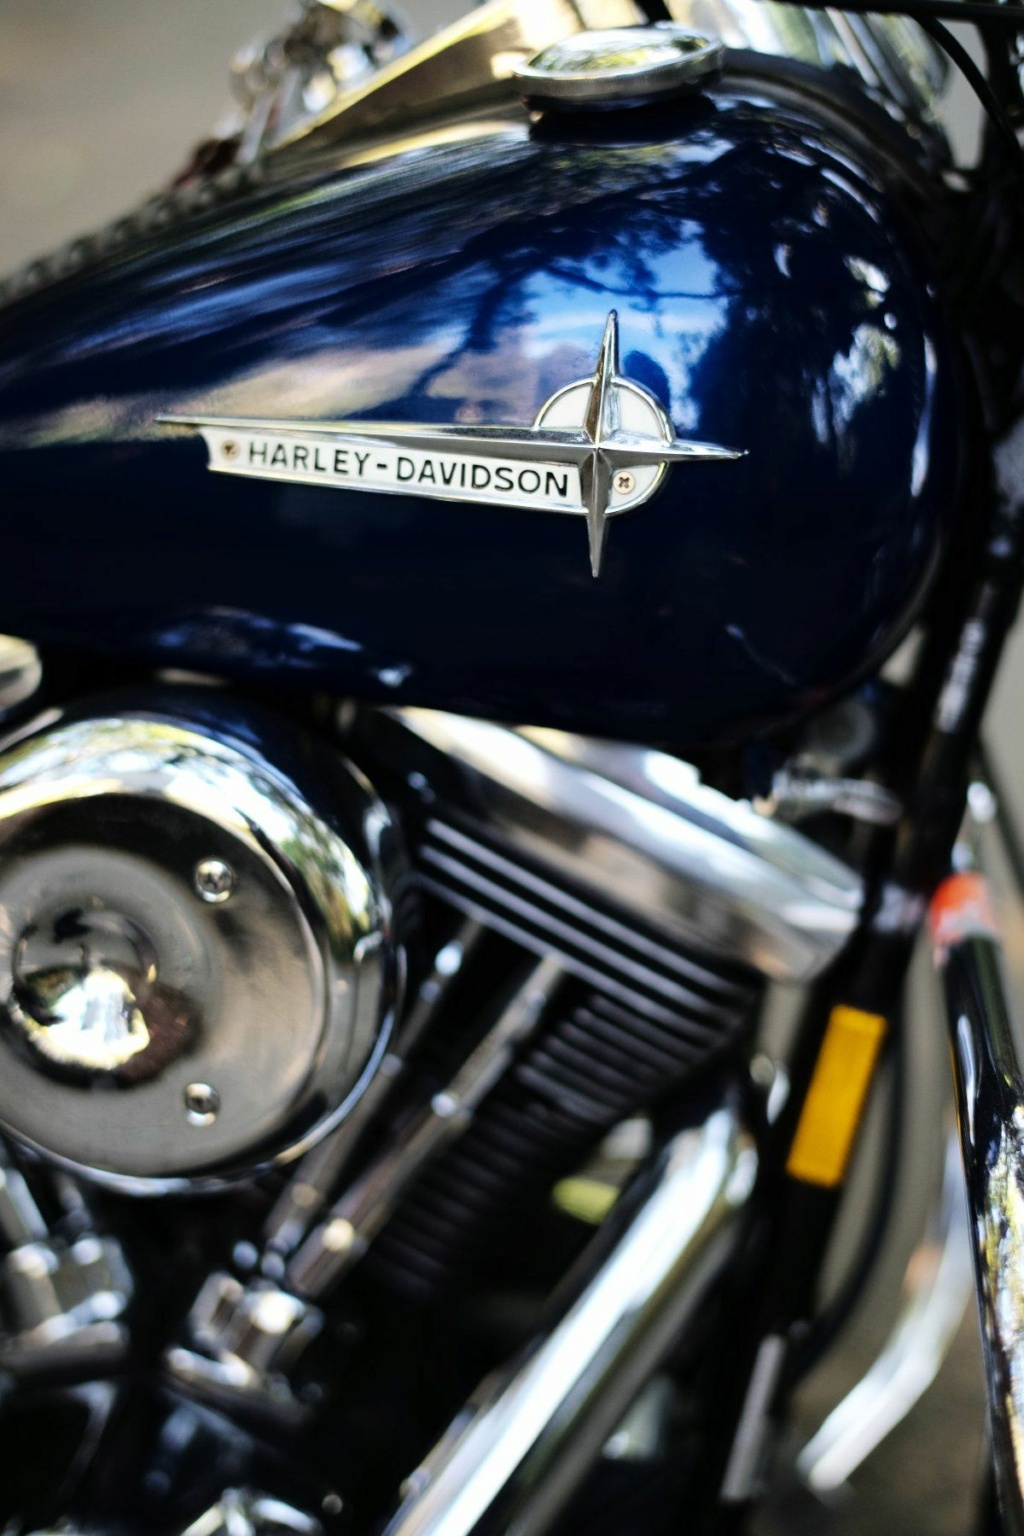 HARLEY DAVIDSON SOFTAIL SPRINGER 1340 CC DE JOHNNY HALLYDAY ( 1989 ) 3118_115